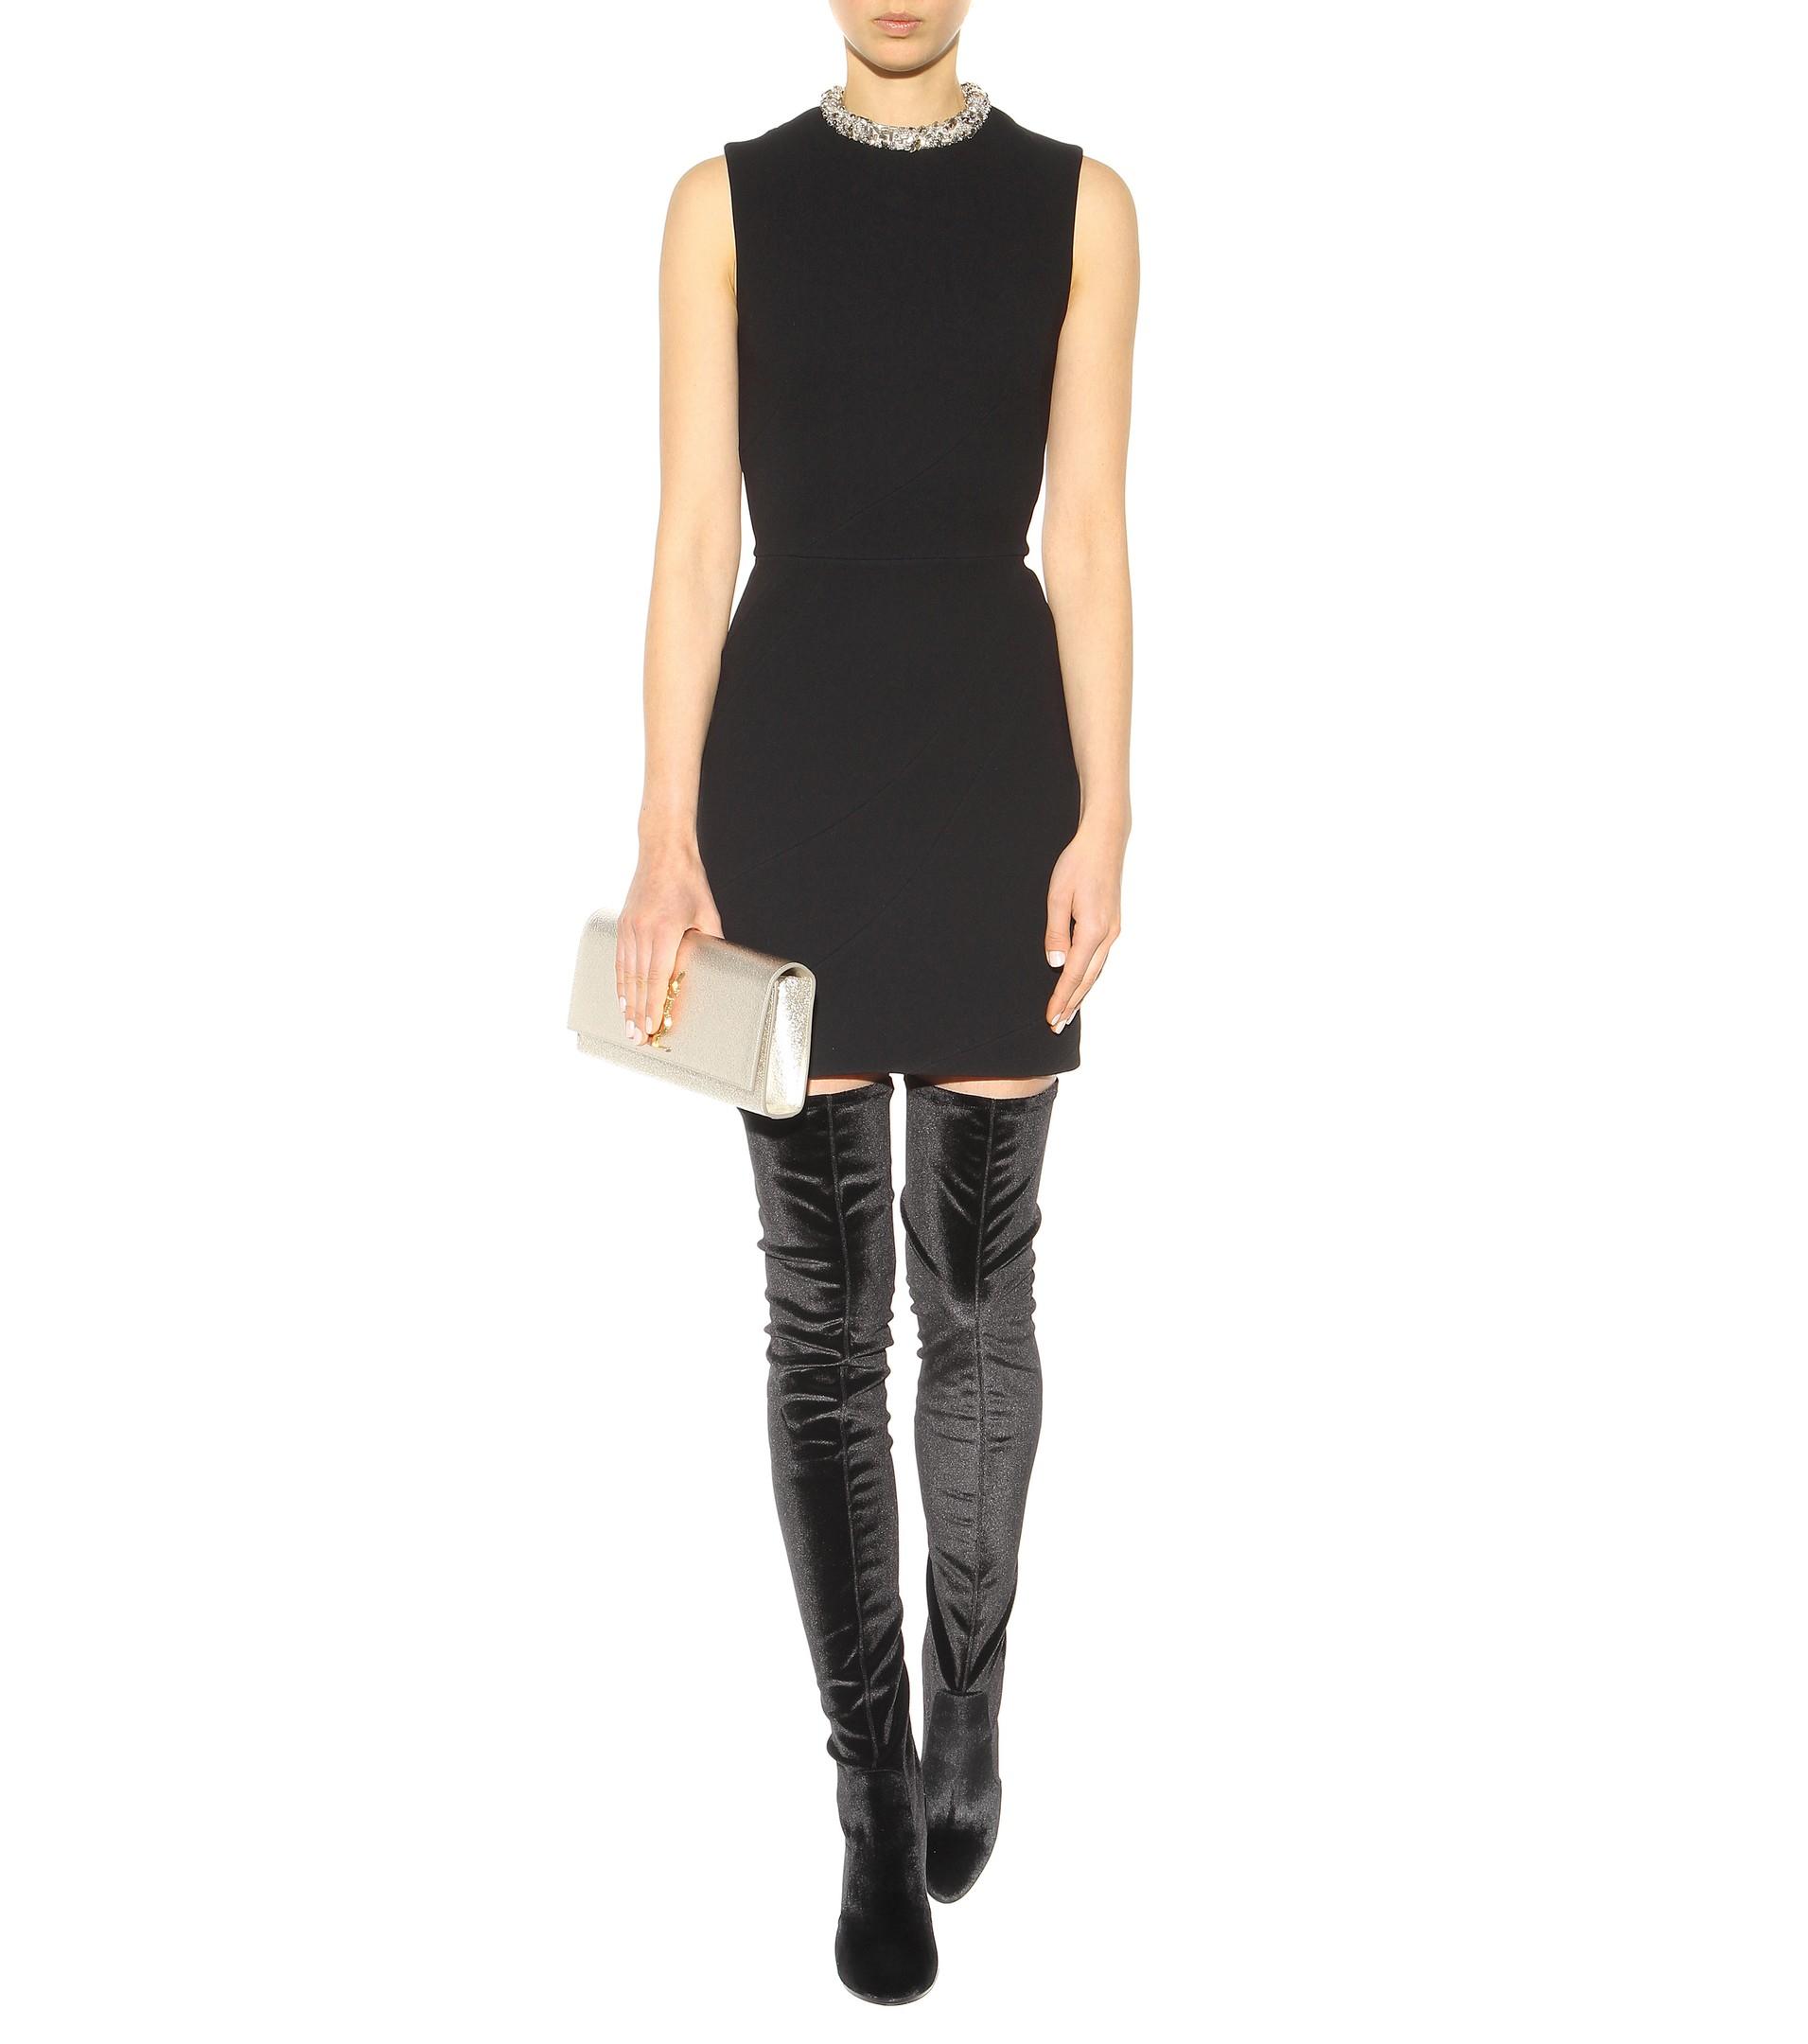 Aquazzura Velvet Over-The-Knee Boots in Black | Lyst